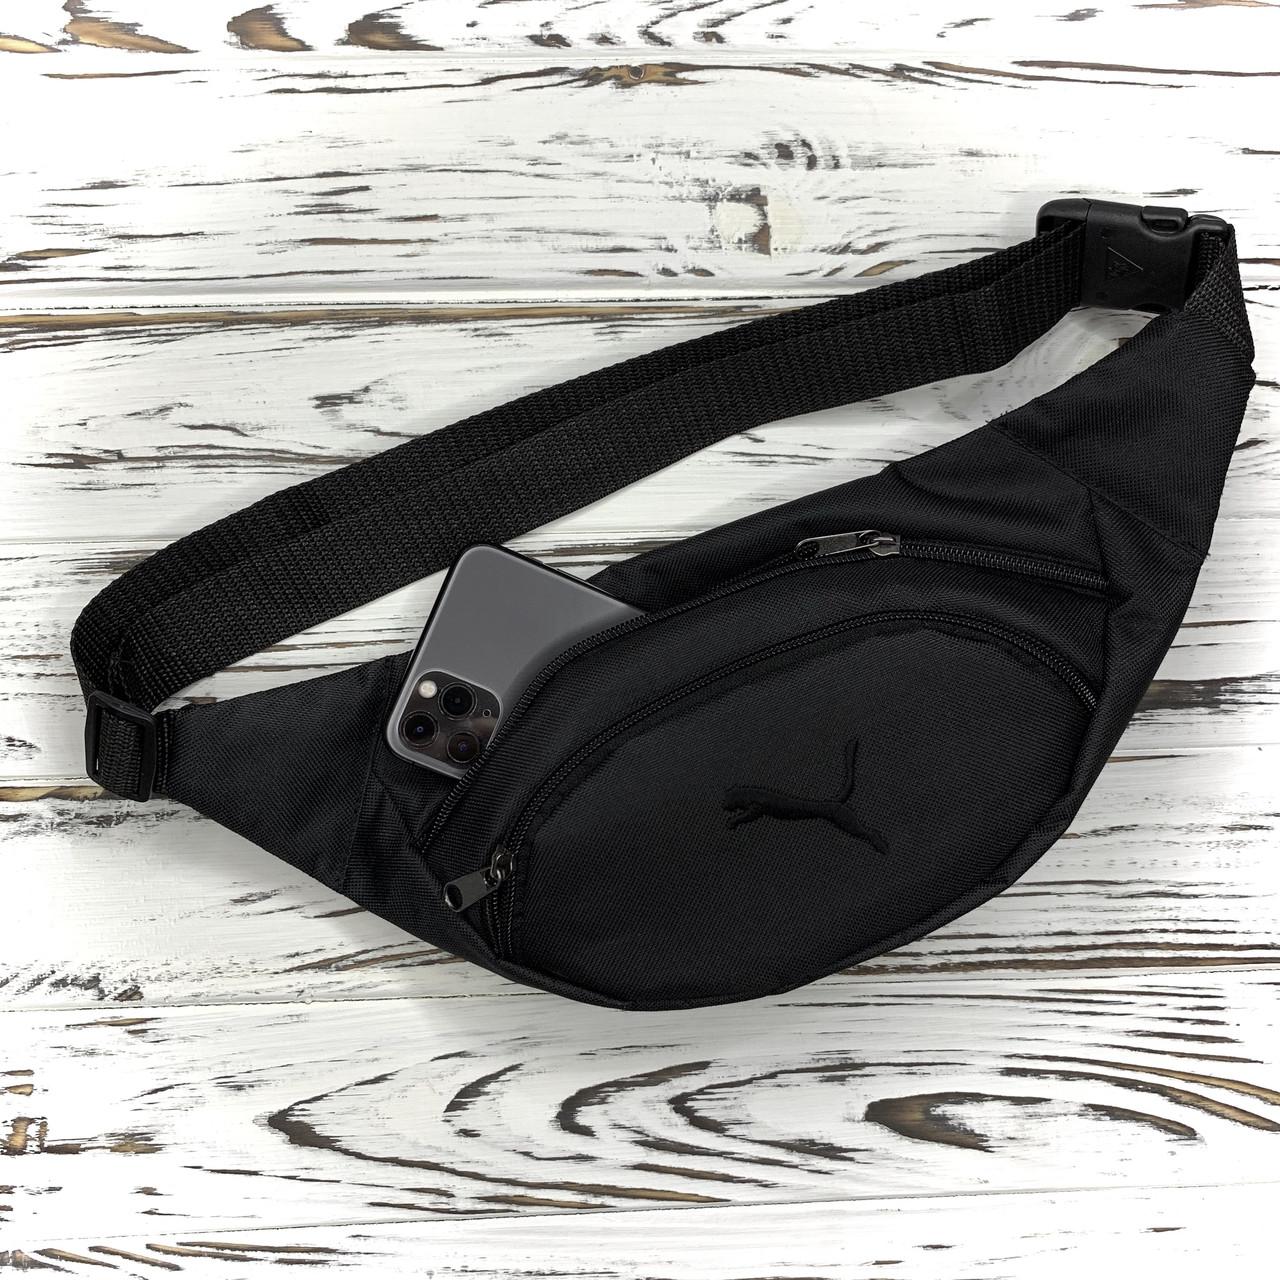 Мужская поясная сумка Puma черная, Бананка